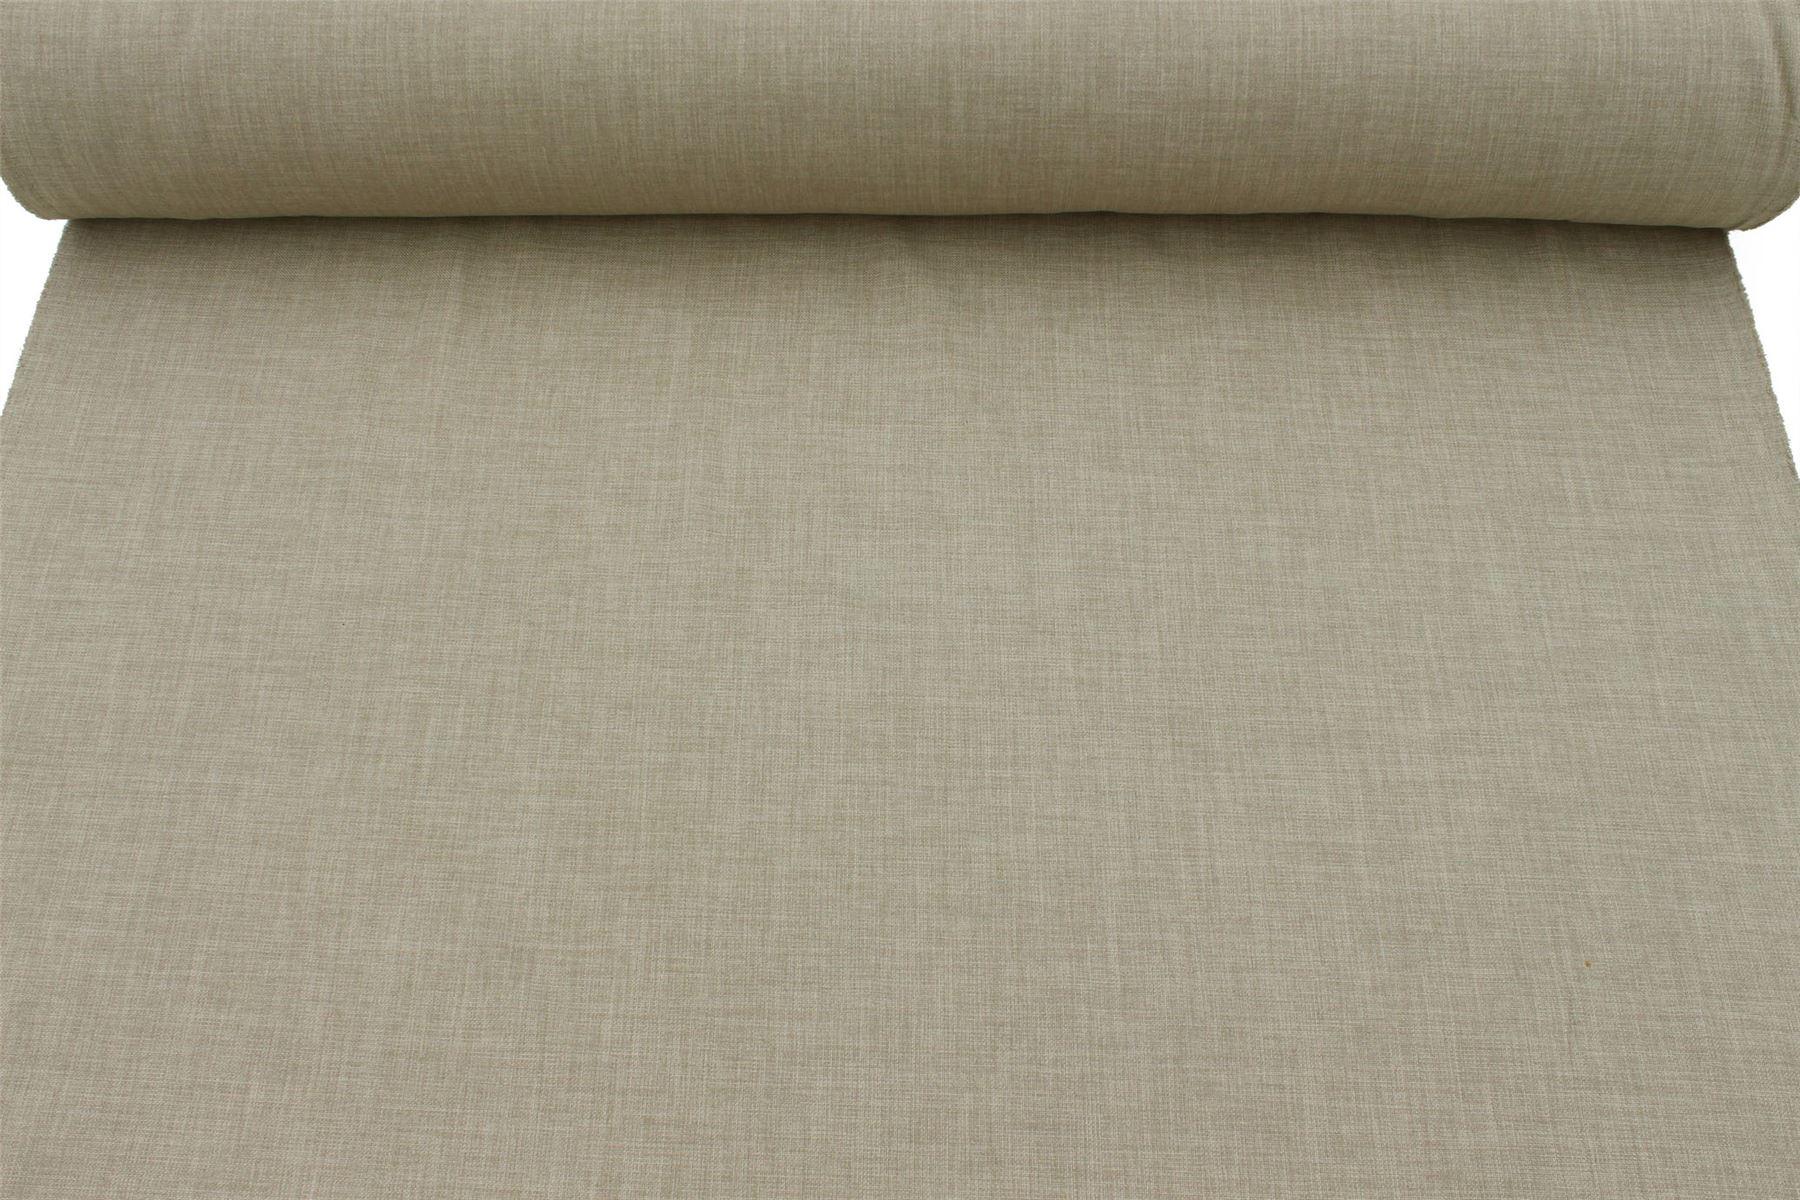 soft sofa material monarch chocolate brown microfiber sectional plain linen look designer curtain cushion